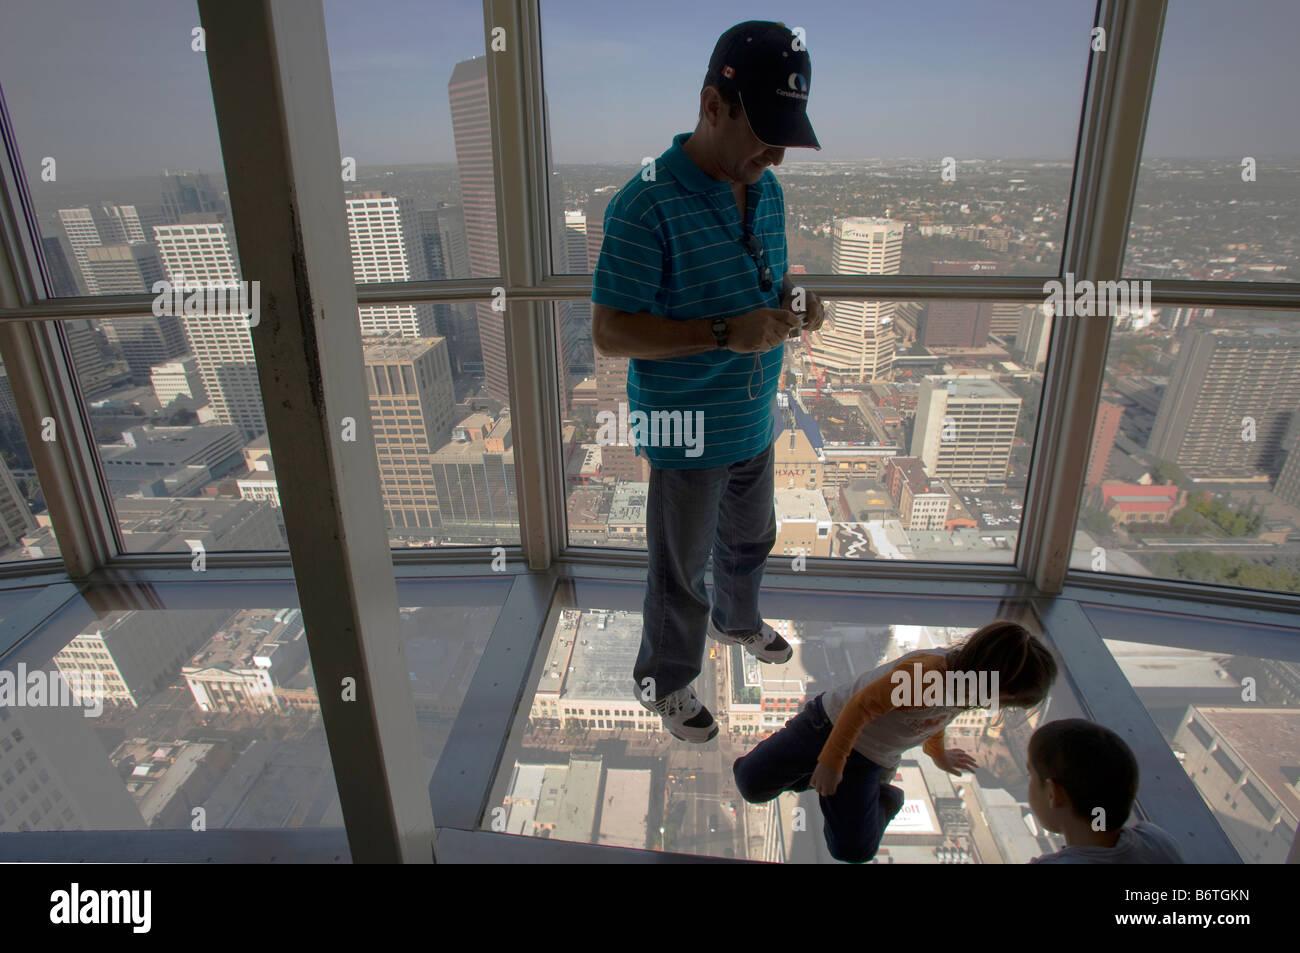 Calgary tower viewing platform - Stock Image